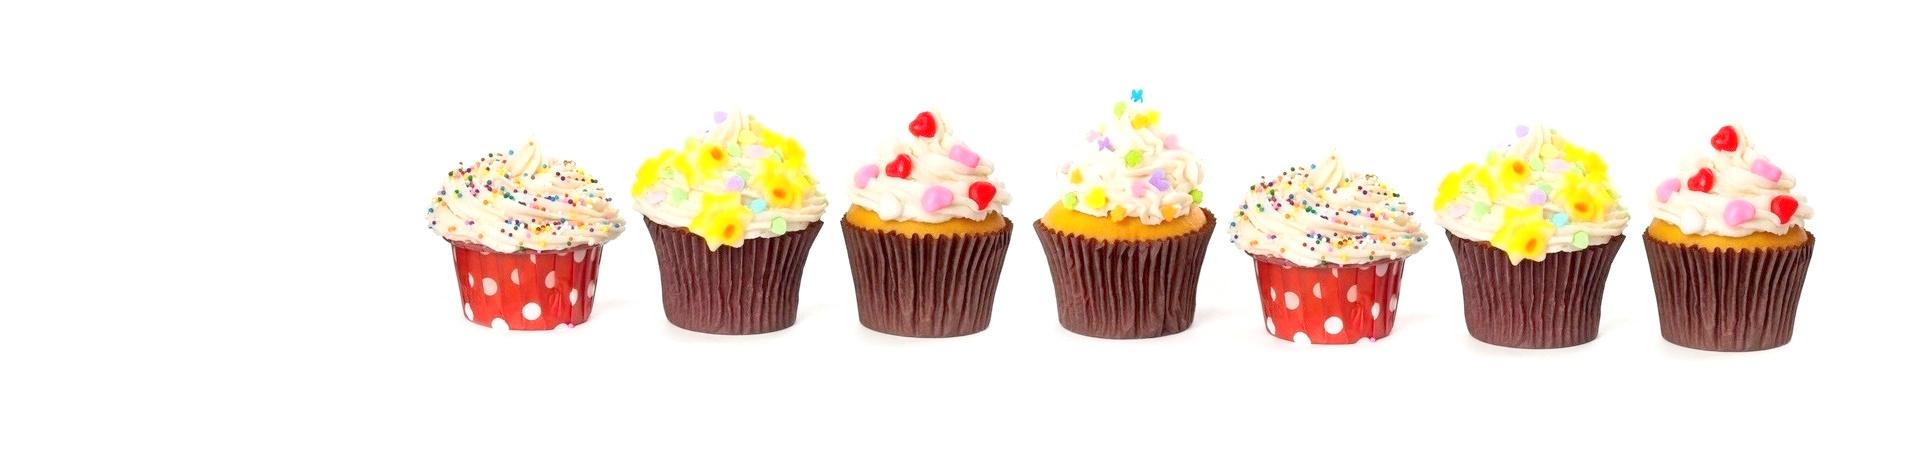 Sladké cupcakes